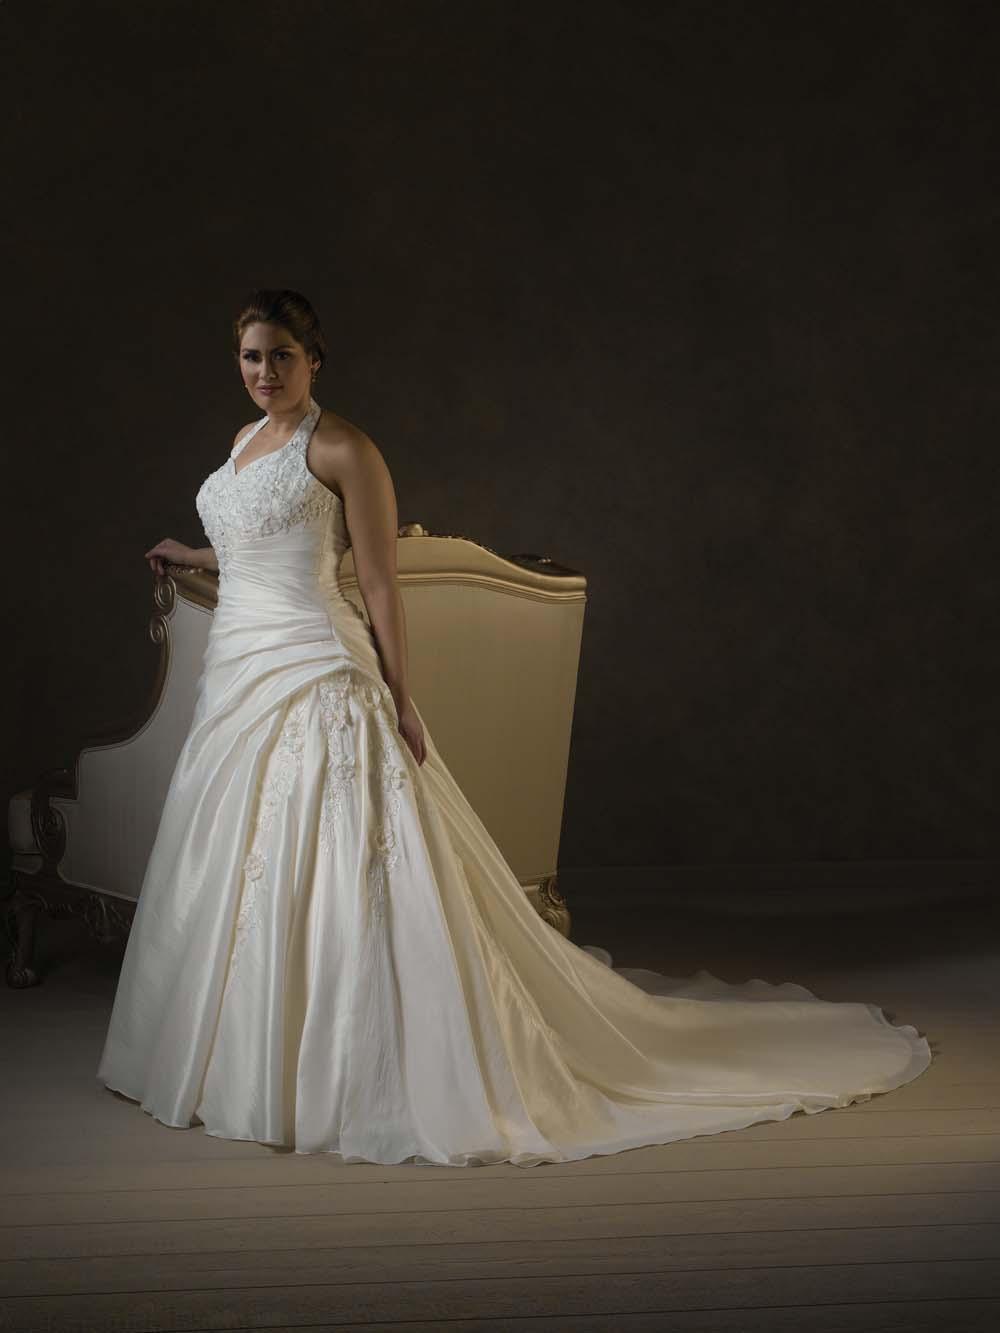 Picm5 Halter Wedding Dresses For Plus Size Women Darius Fashion